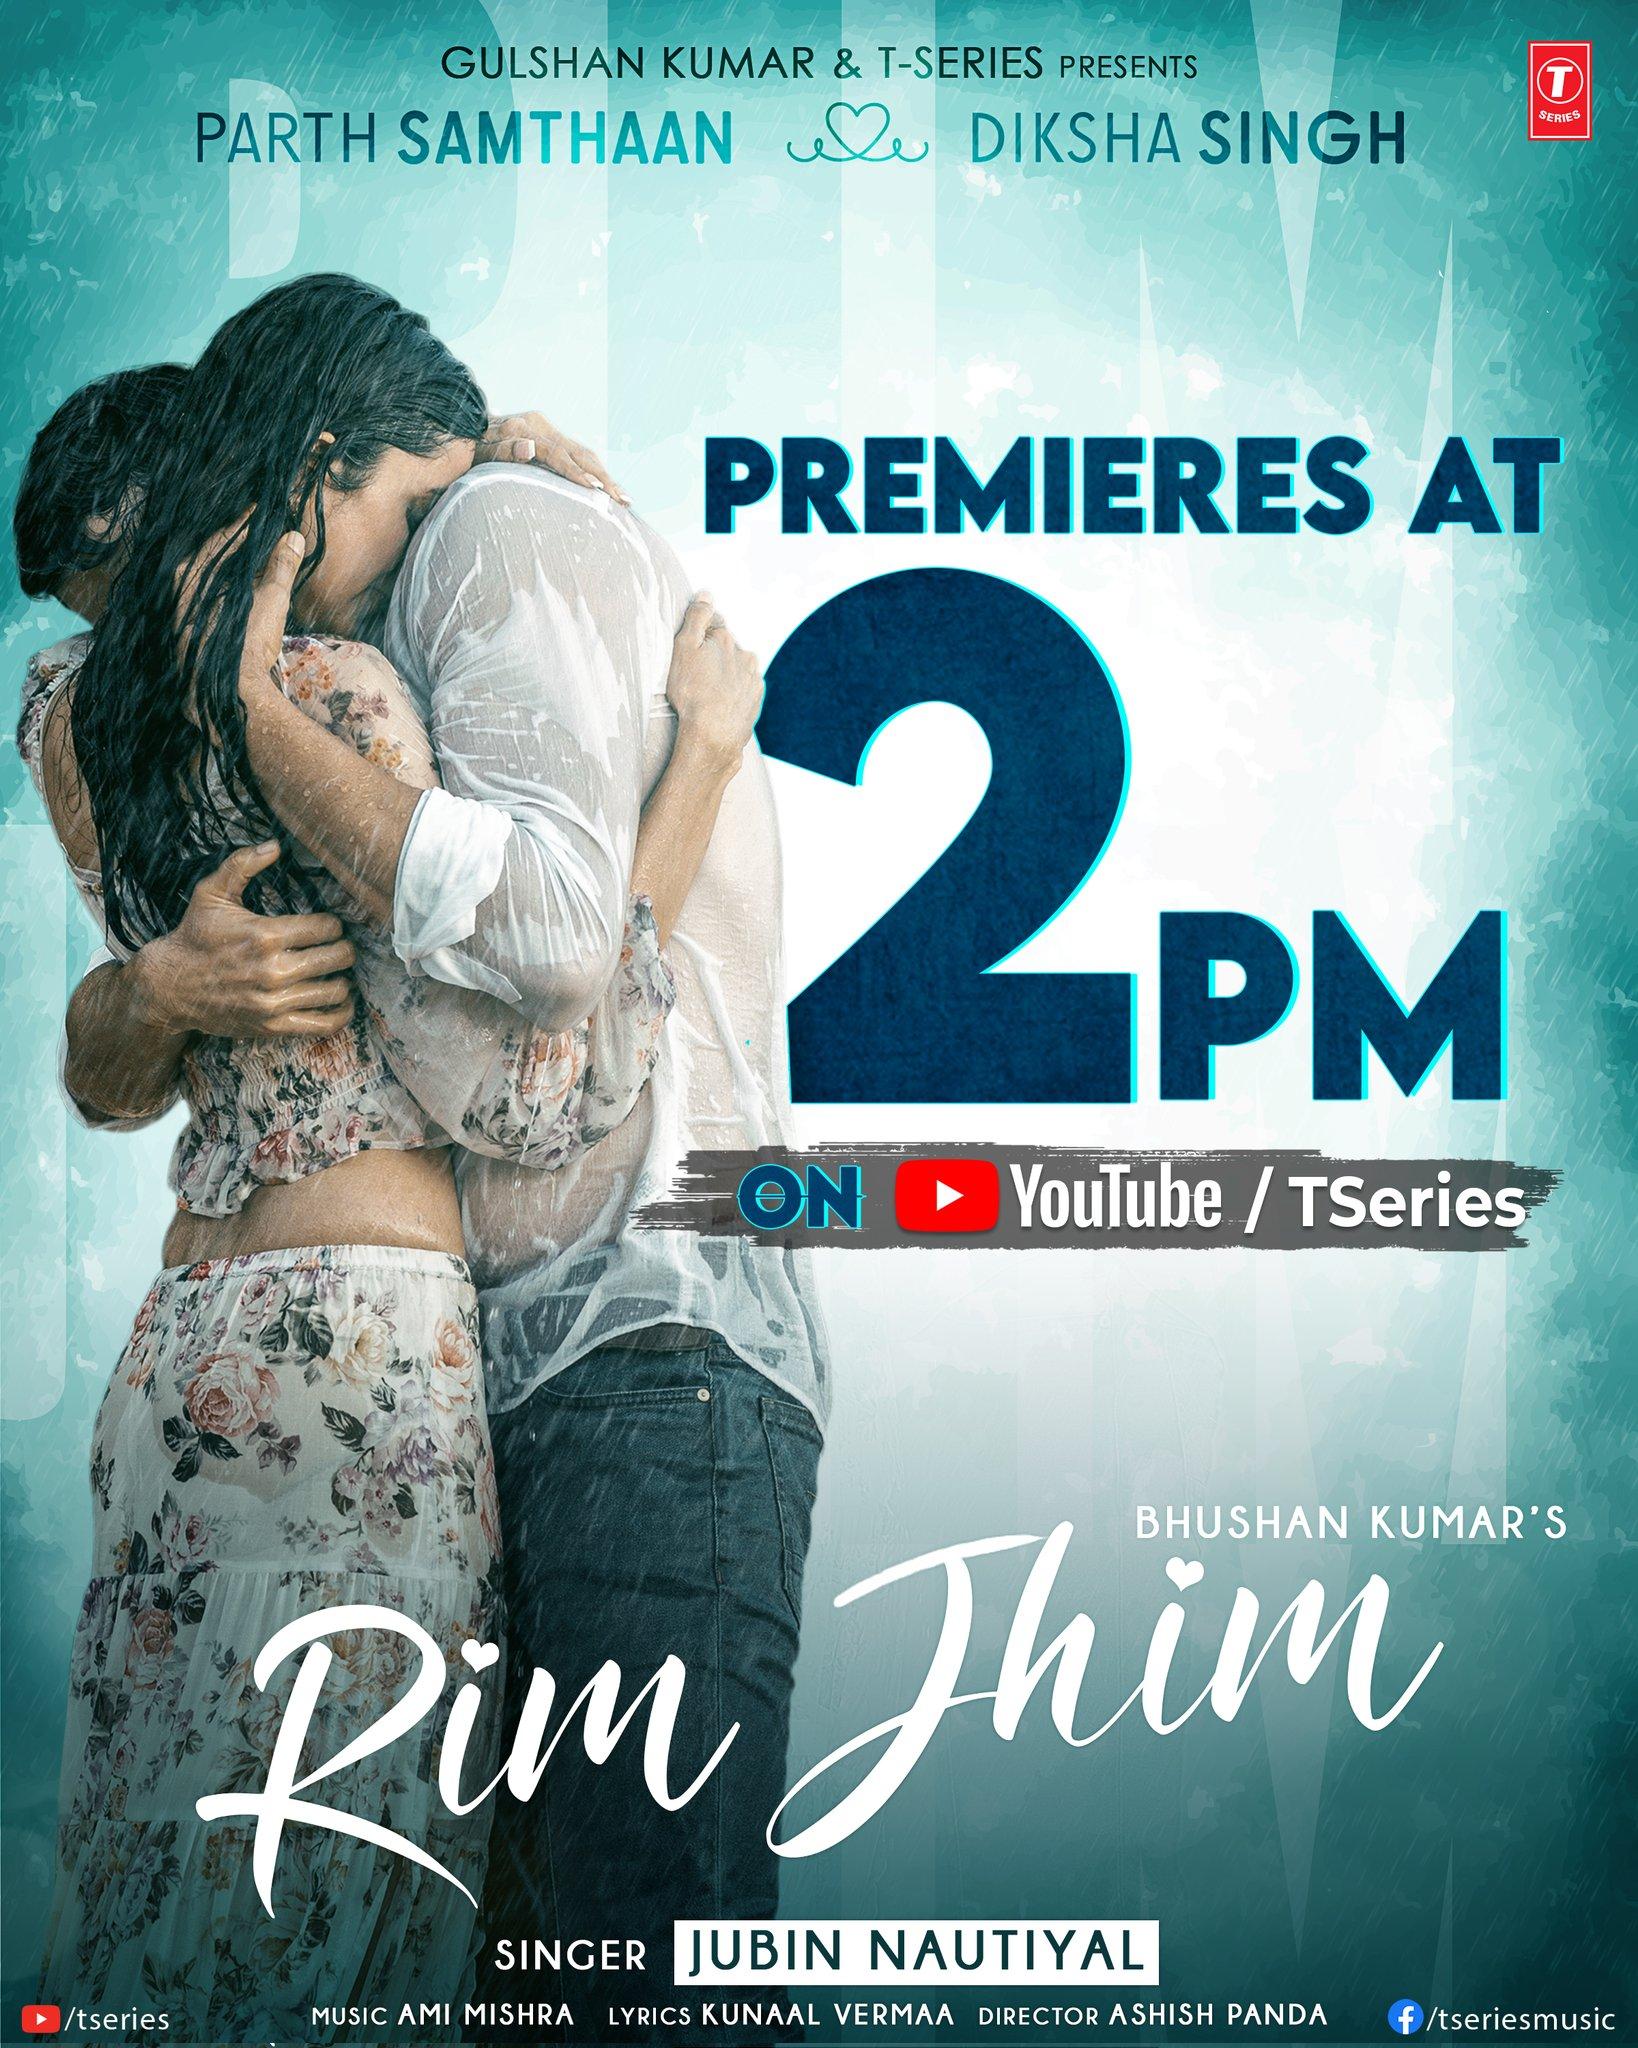 Rim Jhim By Jubin Nautiyal 2021 Official Hindi Music Video 1080p HDRip 103MB Download